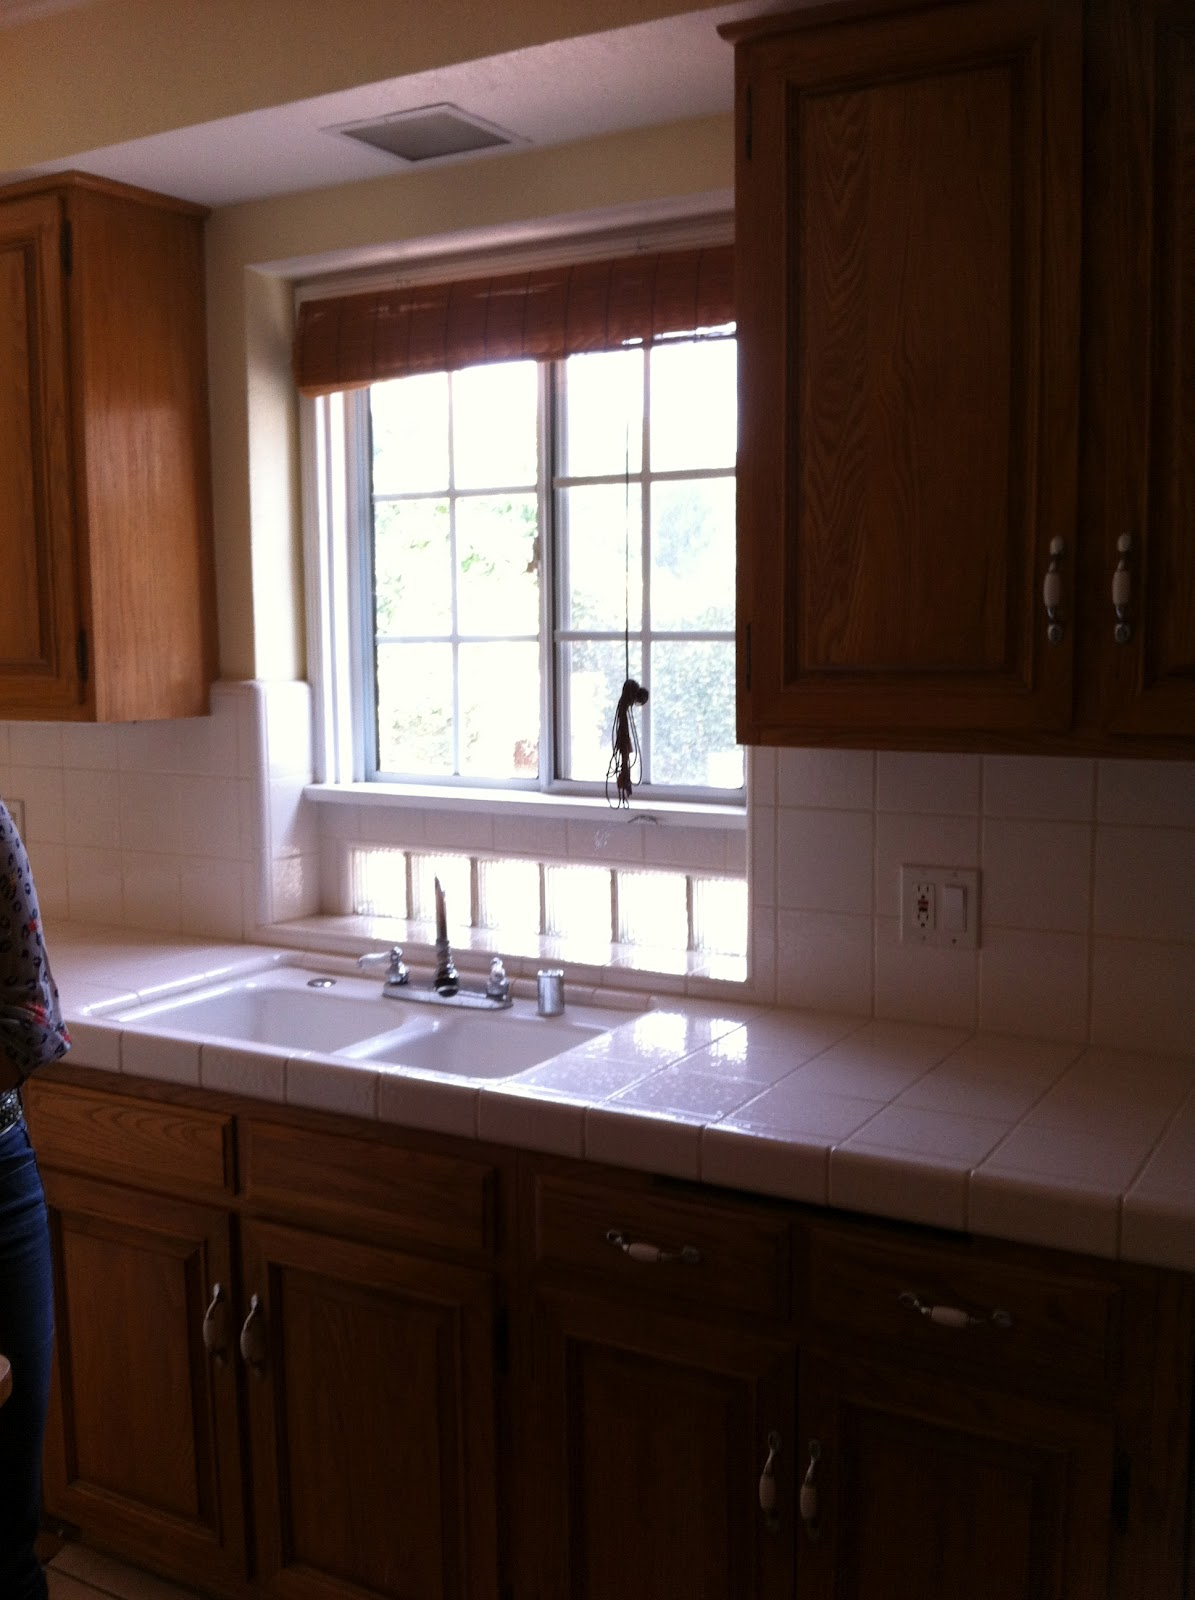 White Pull Out Kitchen Faucet Emi Interior Design Inc House Hunters Renovation Kitchen